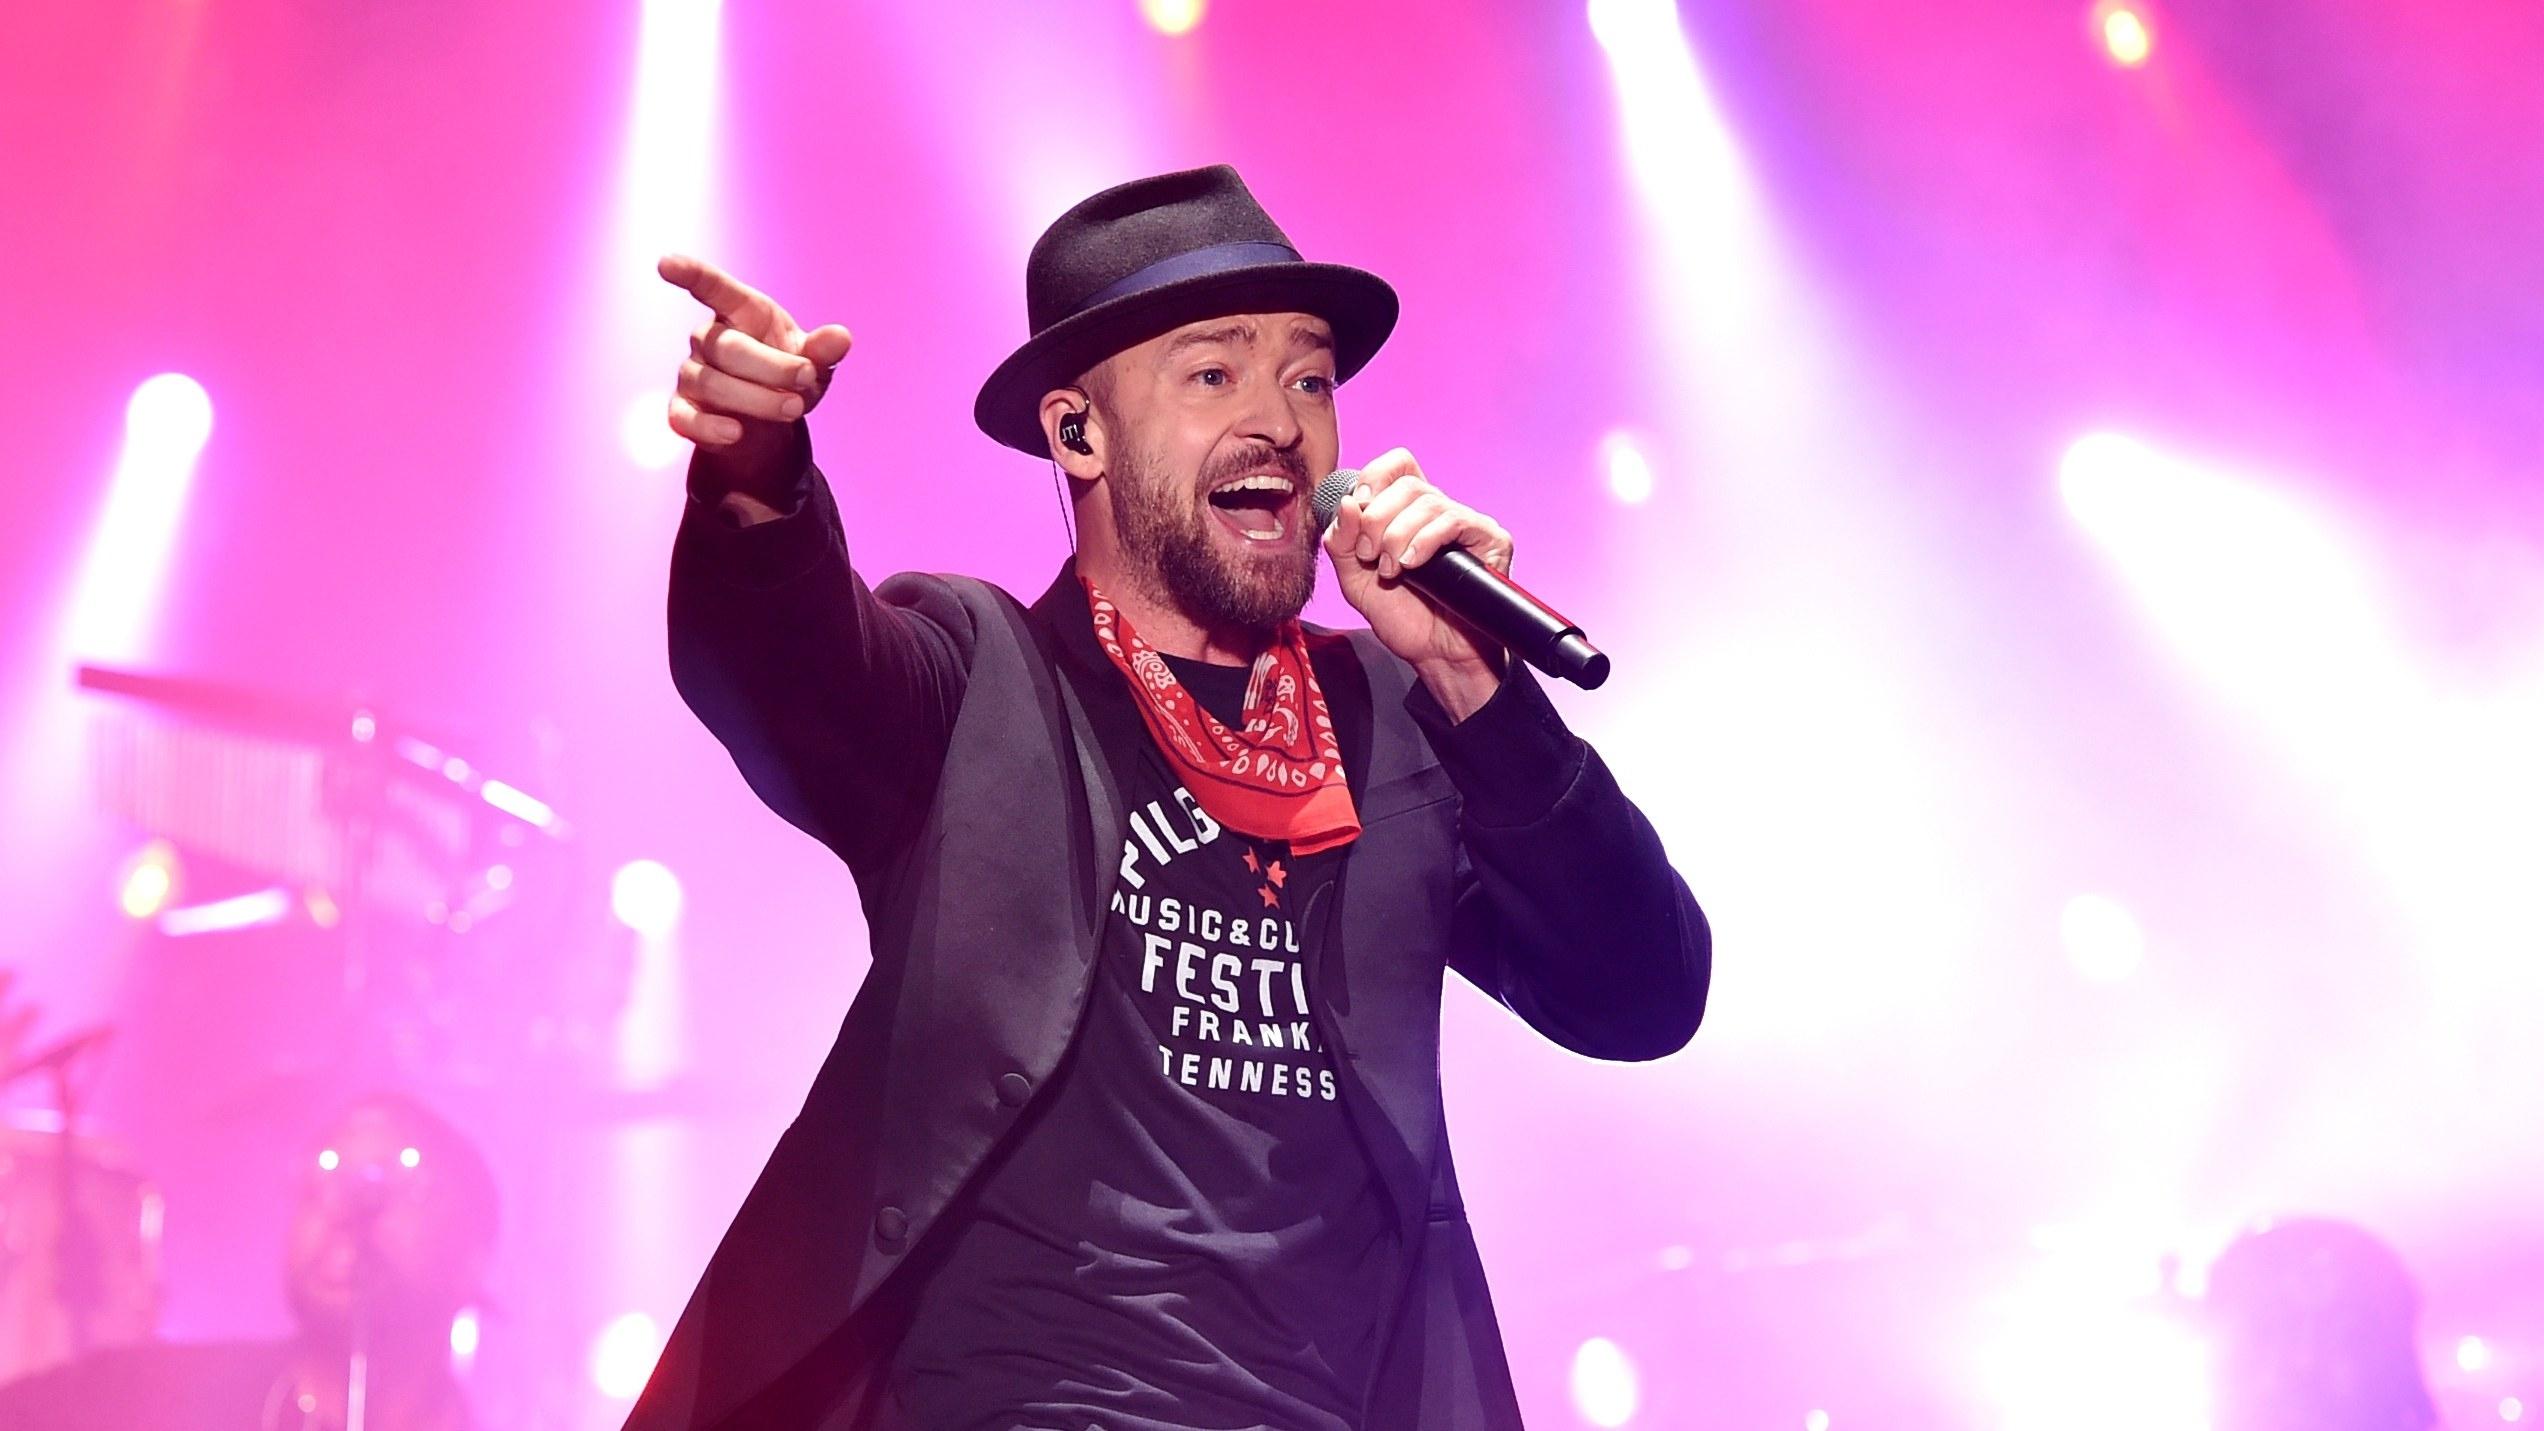 Justin Timberlake To Perform At 2018 Super Bowl Halftime within Justin Timberlake Super Bowl 2018